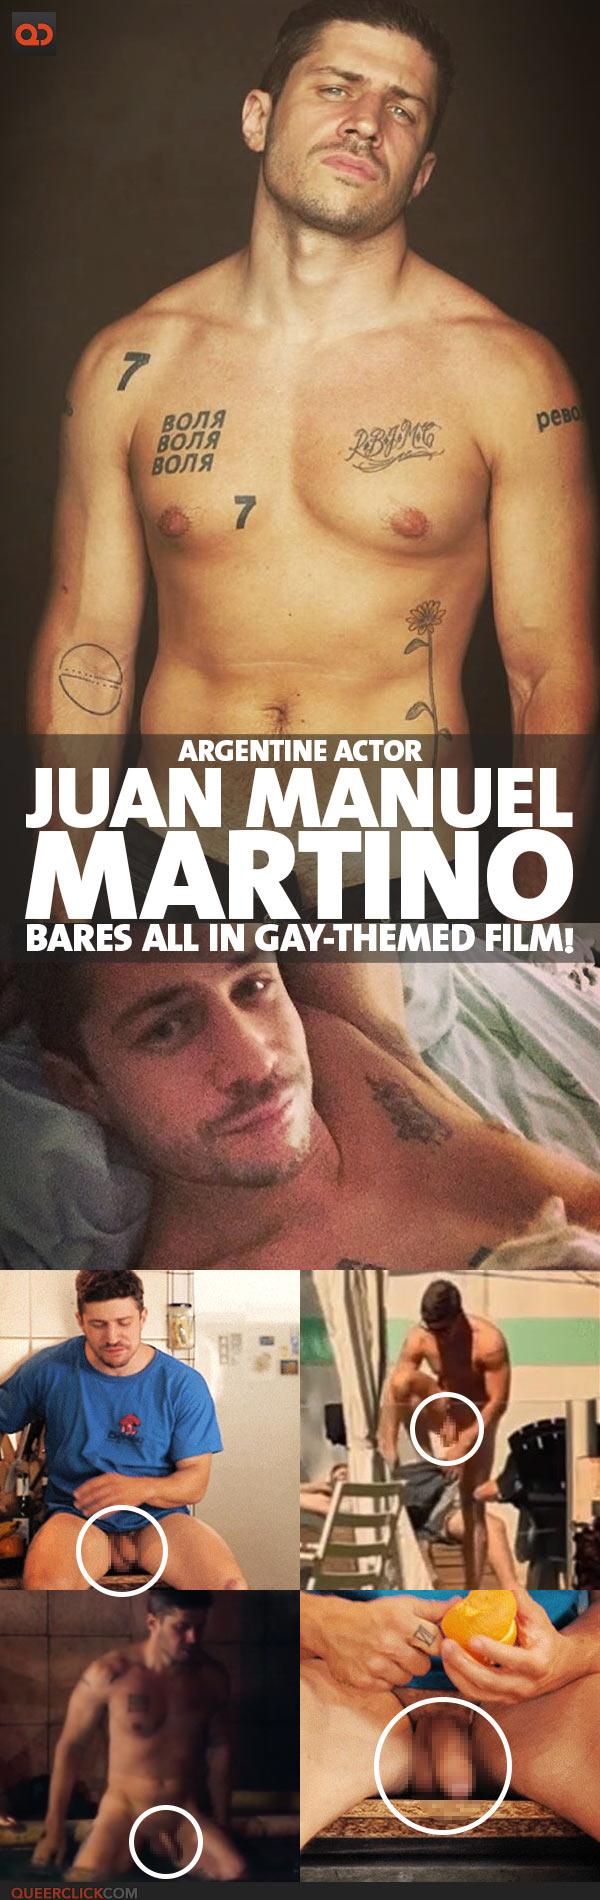 Argentina Boys Gays Porno juan manuel martino, argentine actor, bares all in gay